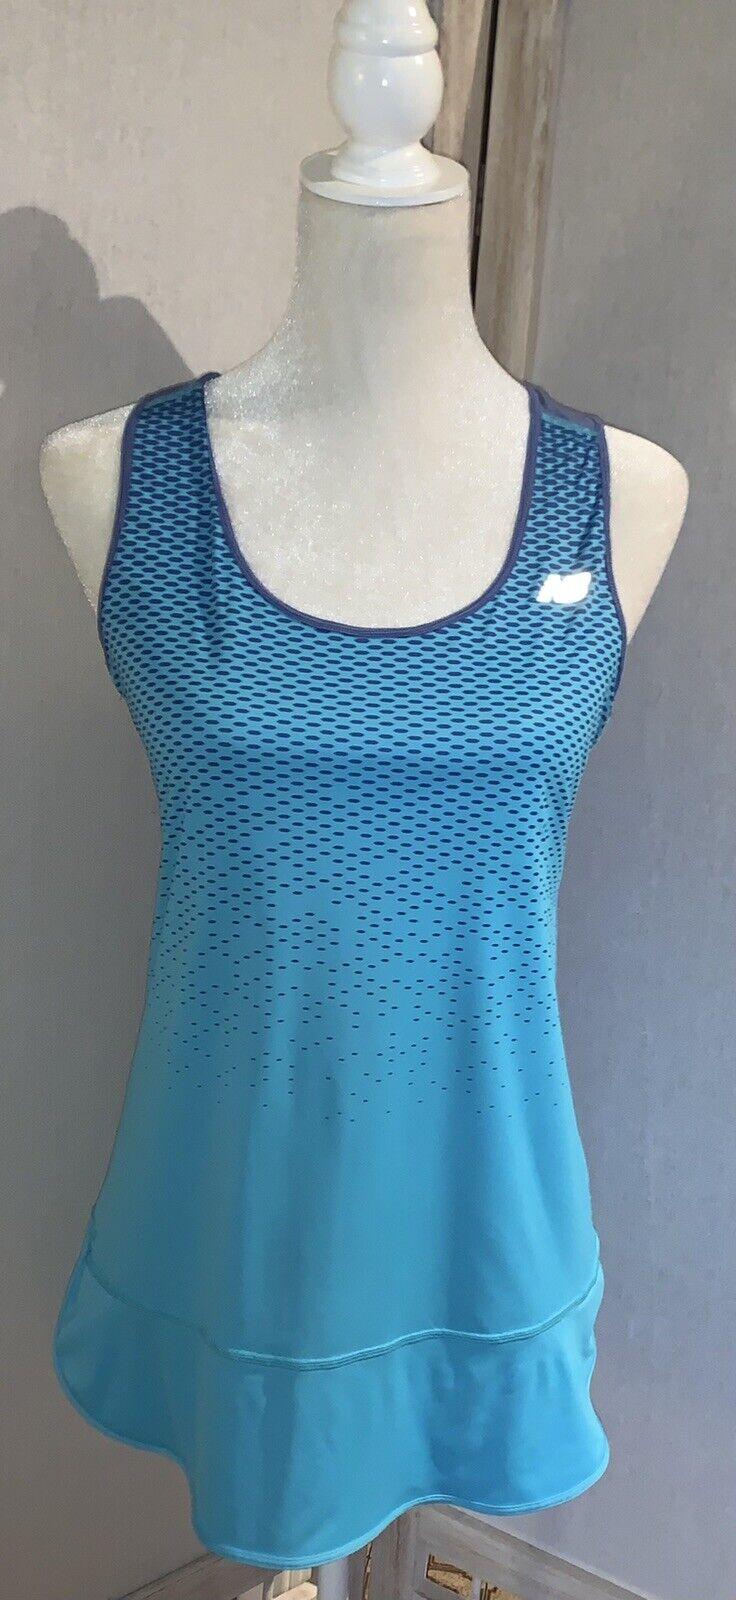 New Balance Medium Athletic Tank Shirt Multi-Color Sleeveless Slits Dots Runn